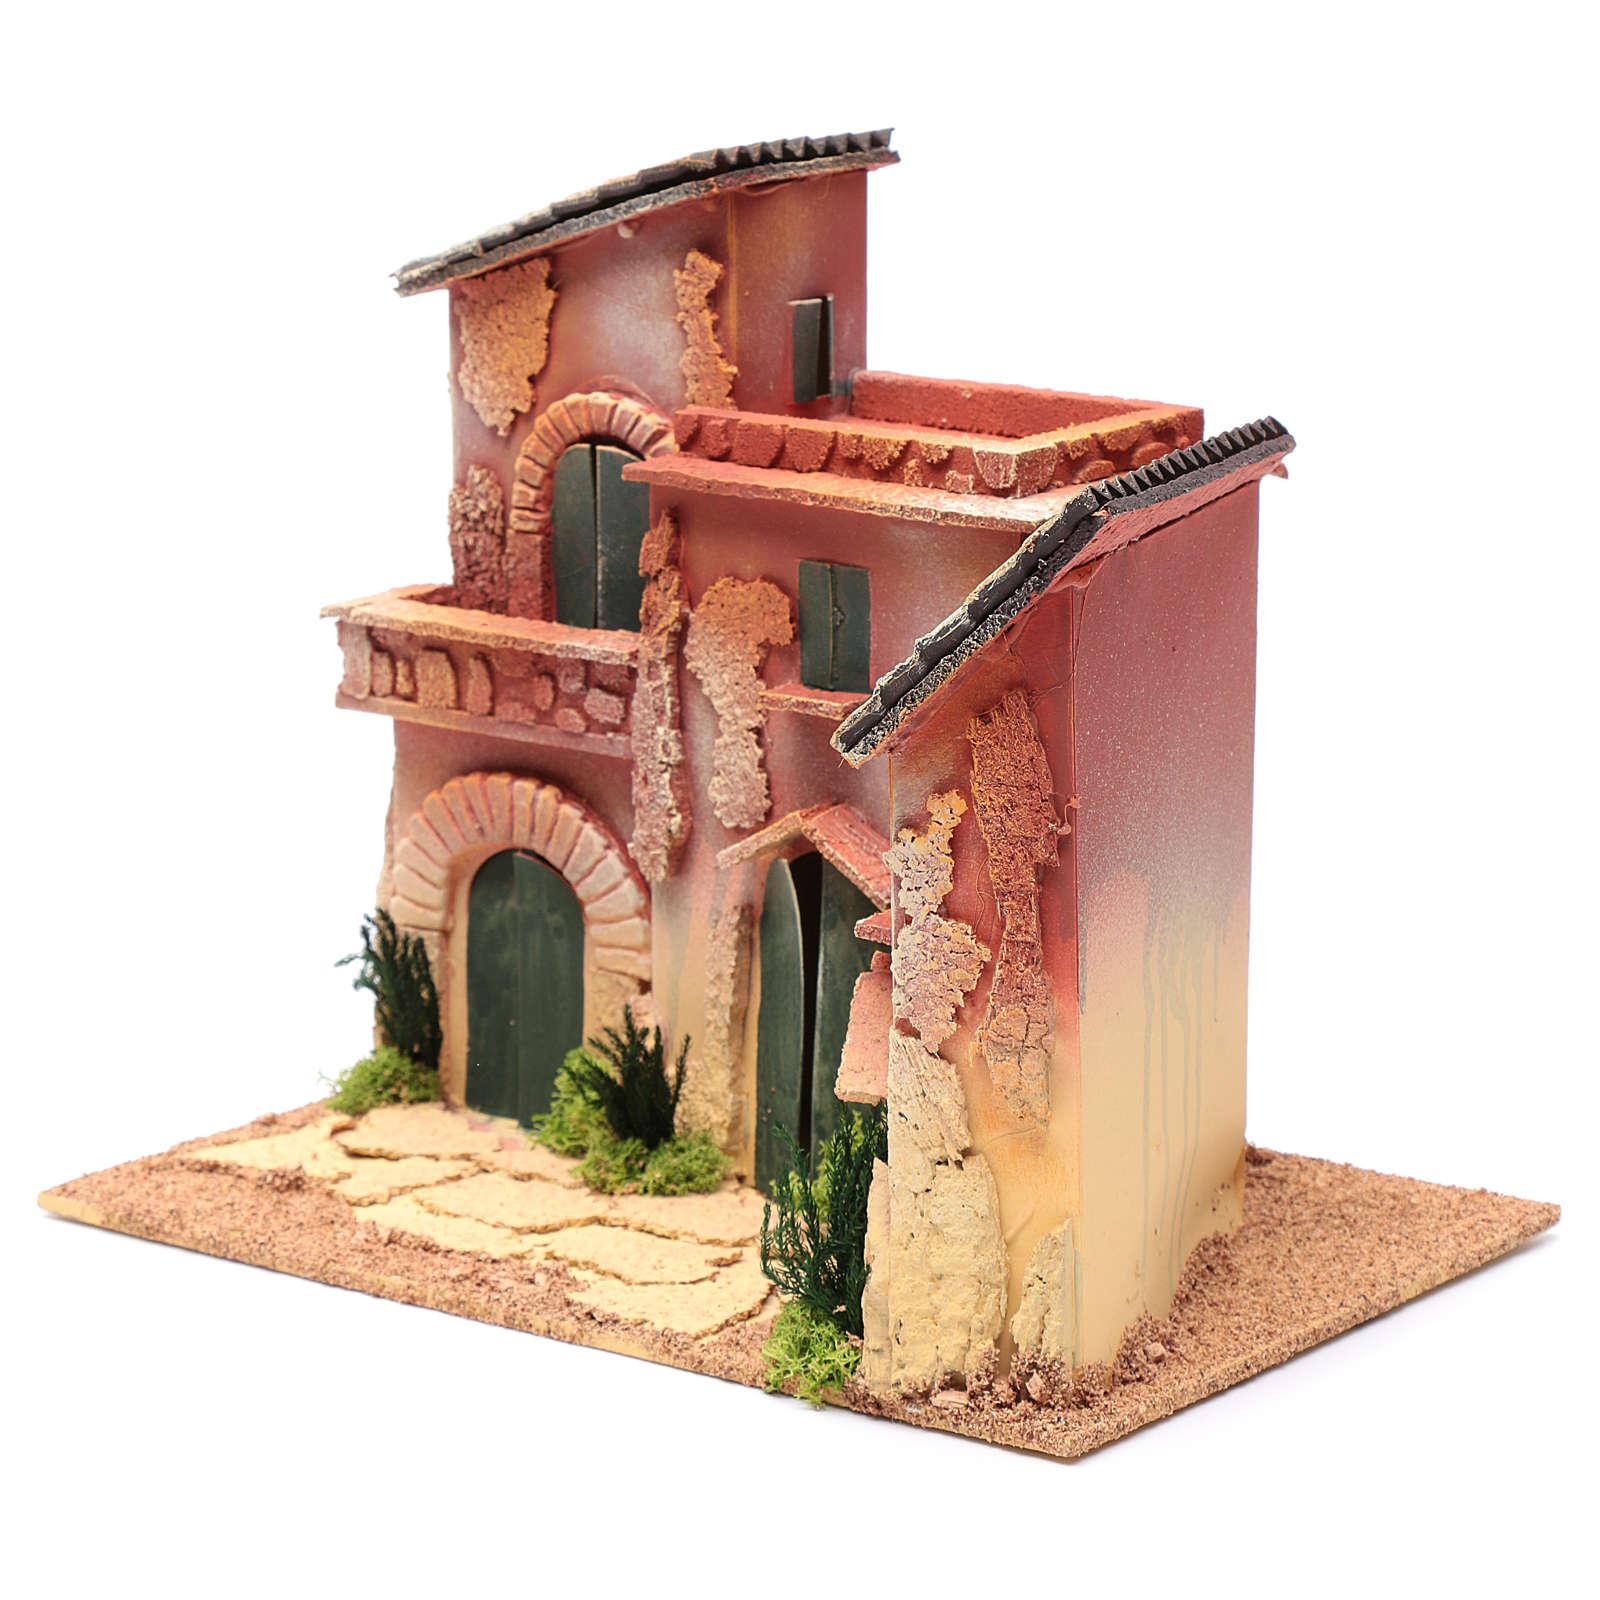 Borgo case 25x30x20 cm per presepe 4